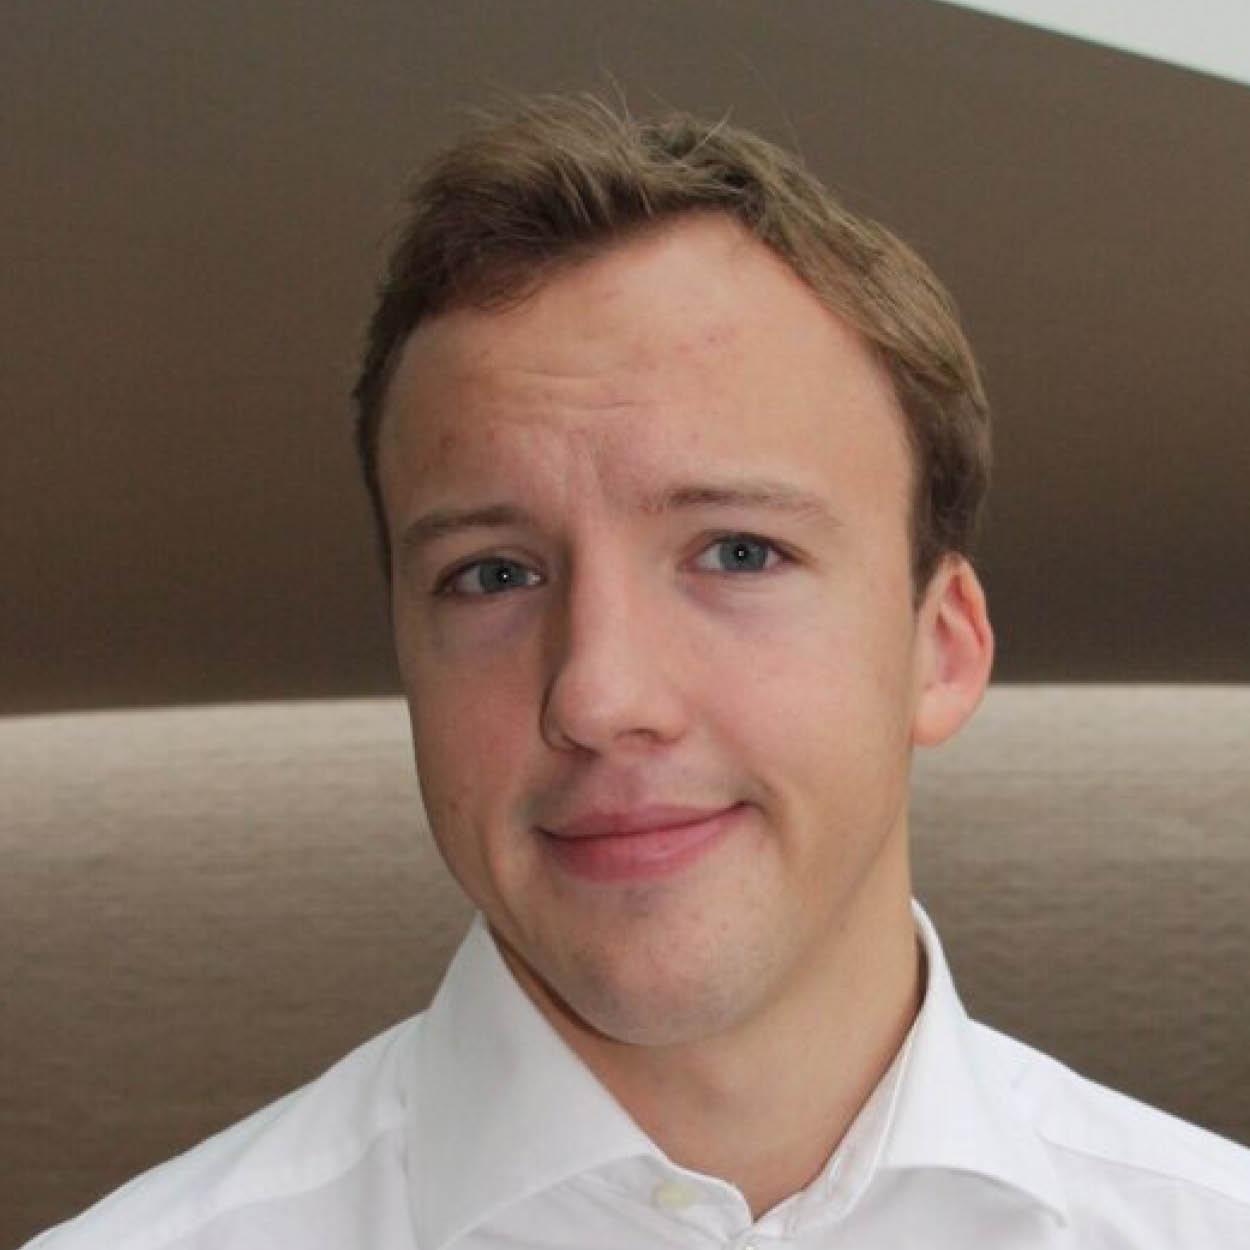 Jens Erik Eidsvig i Næringslivsutvalget NTNU